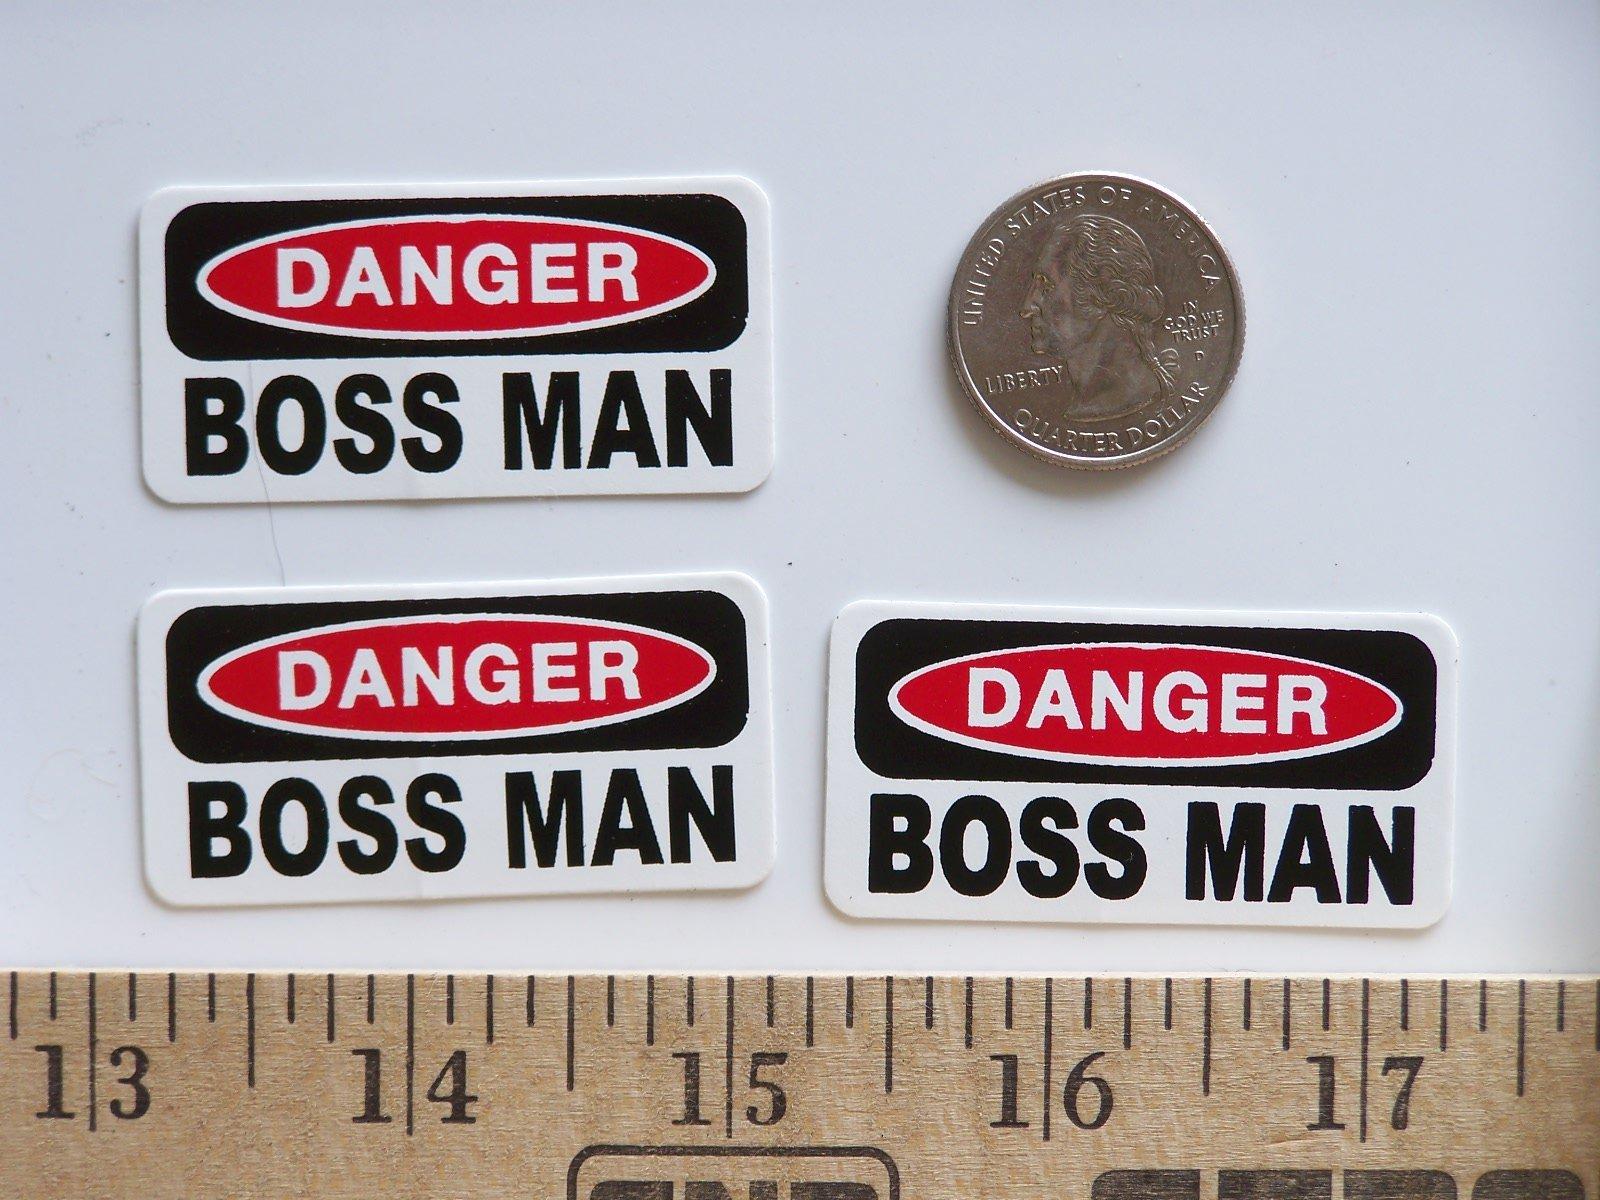 "3 - Danger Boss Man Hard Hat/Helmet Stickers 1"" x 2"" by StickerPirate (Image #1)"